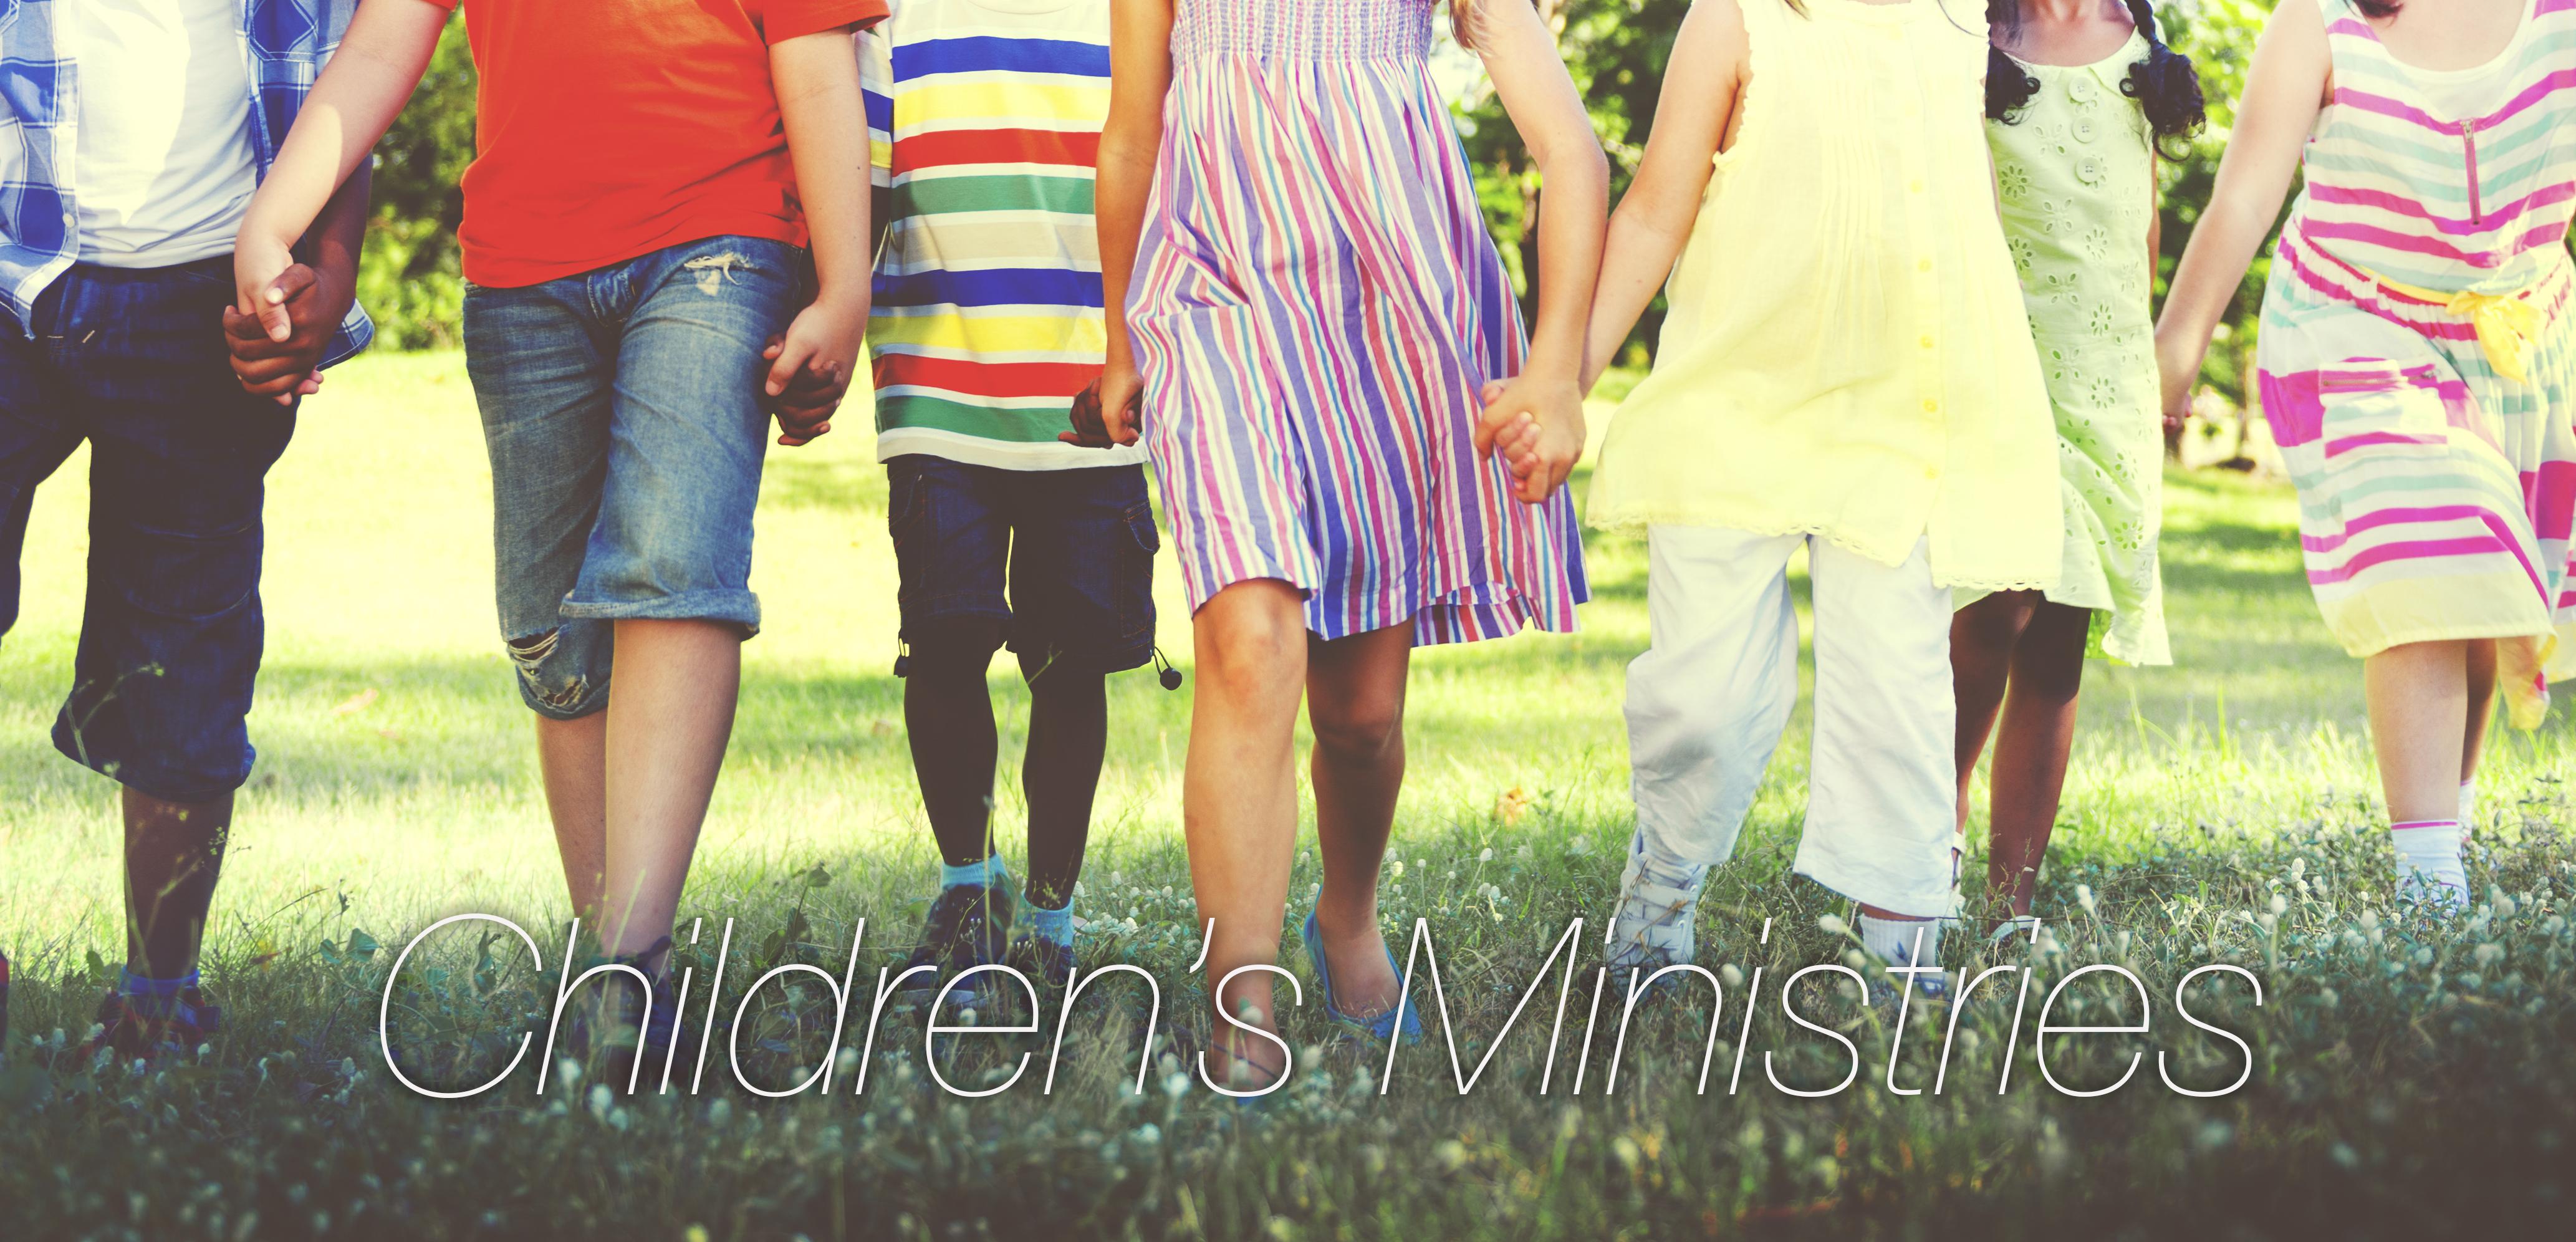 childrensministries